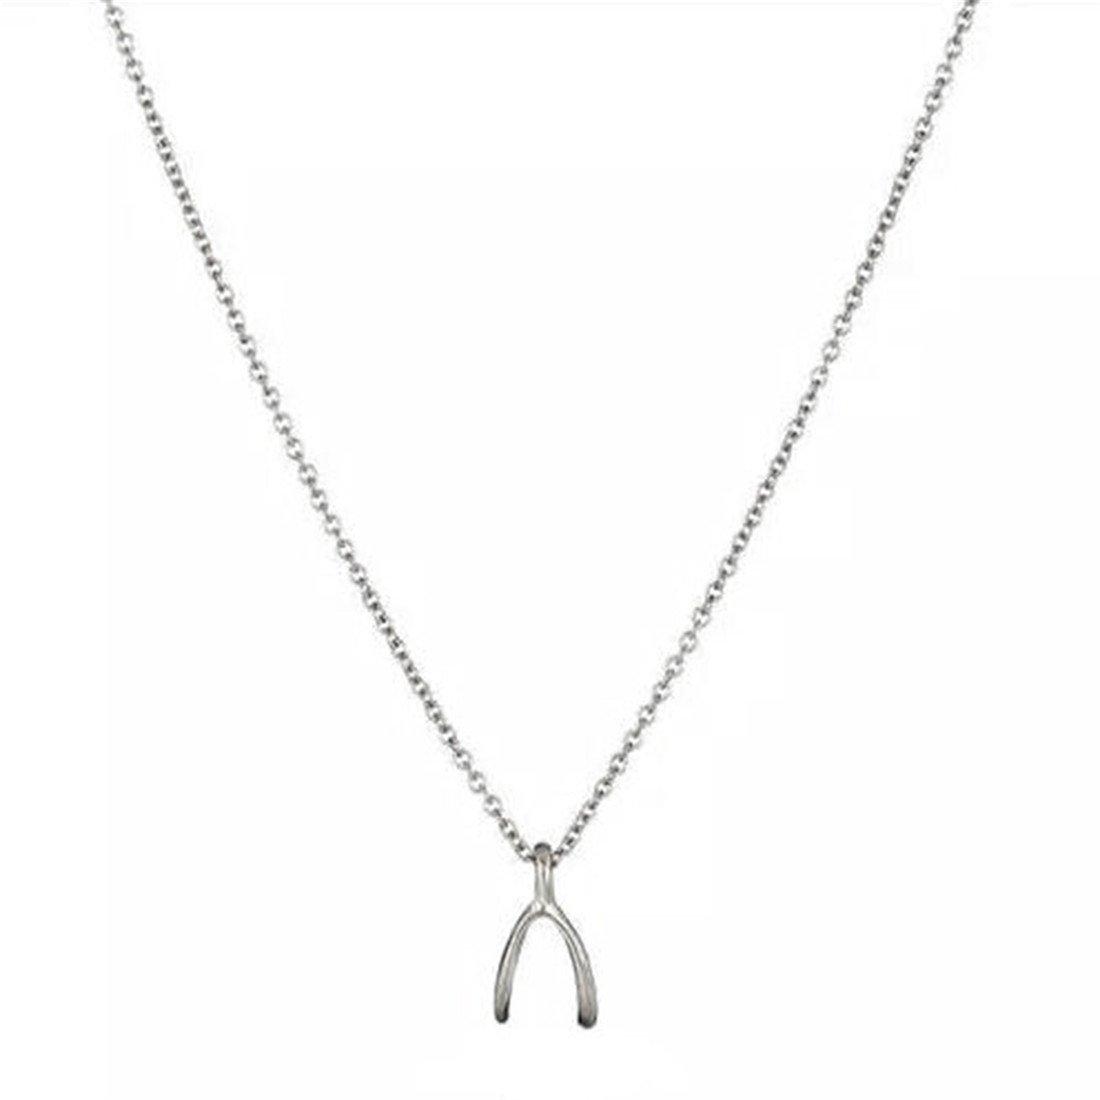 VWH 1 pcs Women Girls Alloy Pendant Necklace Clavicle Bone Chain Necklace Christmas Gift (Wish bone)